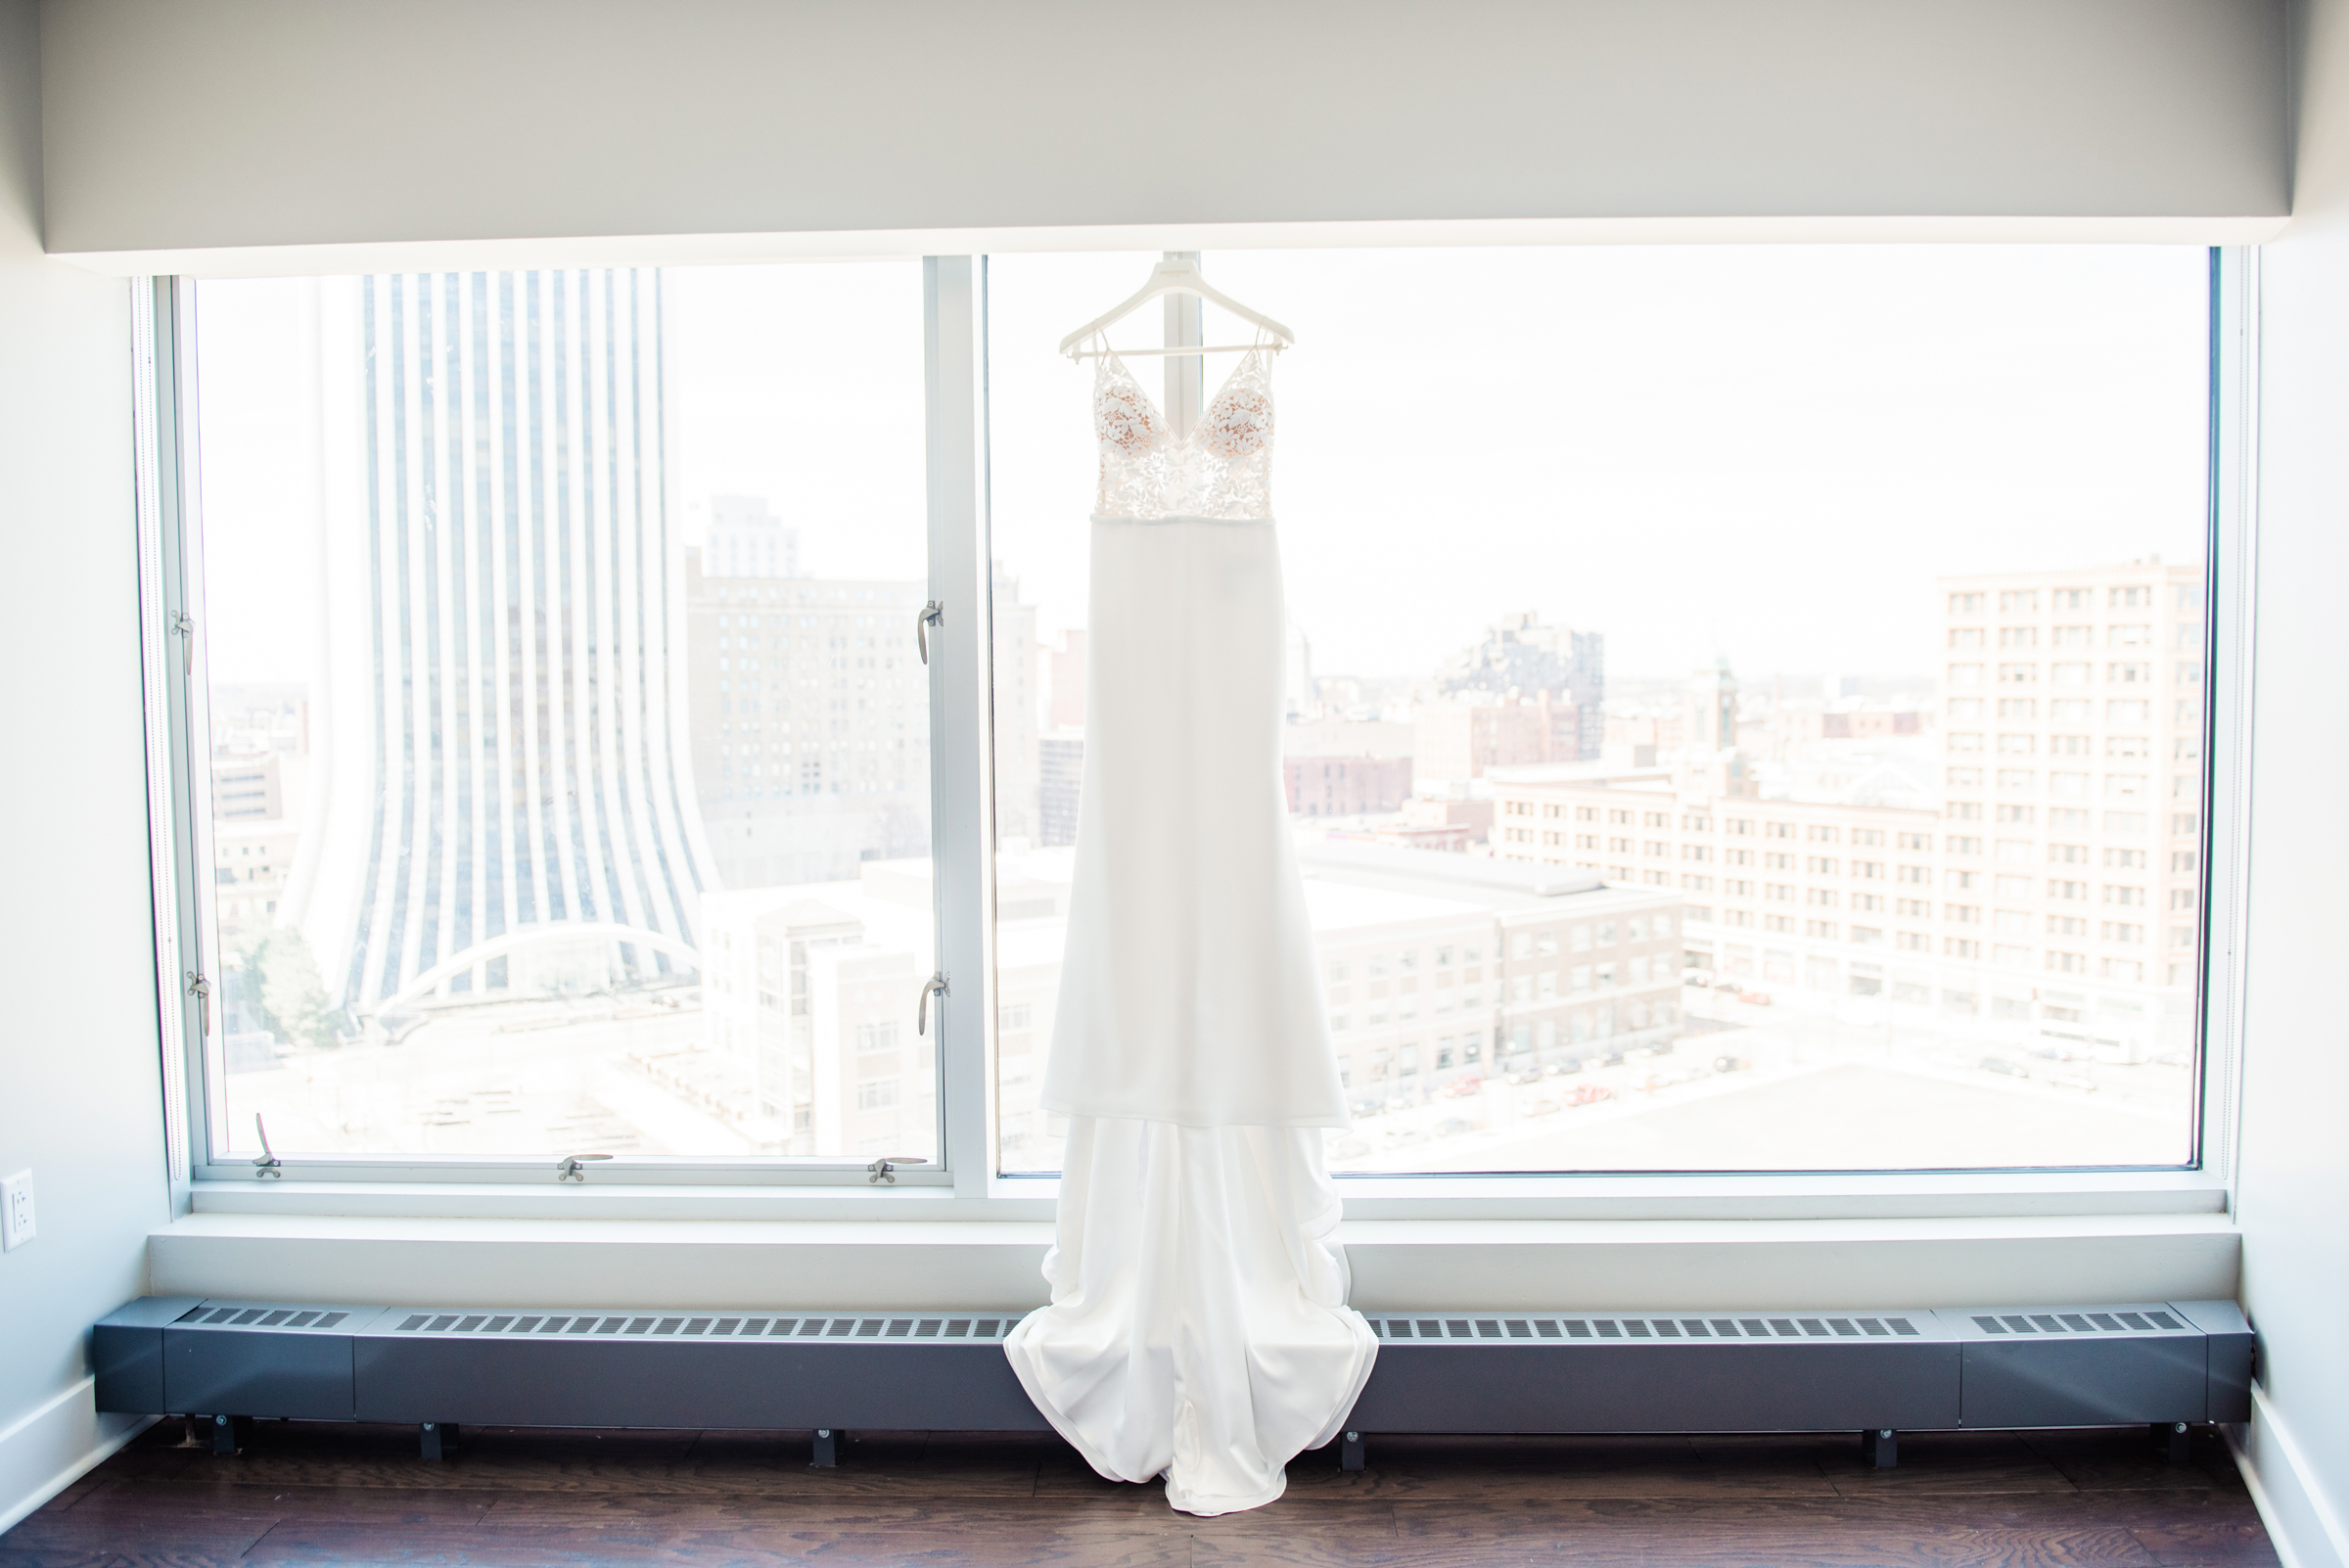 The_Arbor_LoftRochester_Wedding_JILL_STUDIO_Rochester_NY_Photographer_131632.jpg